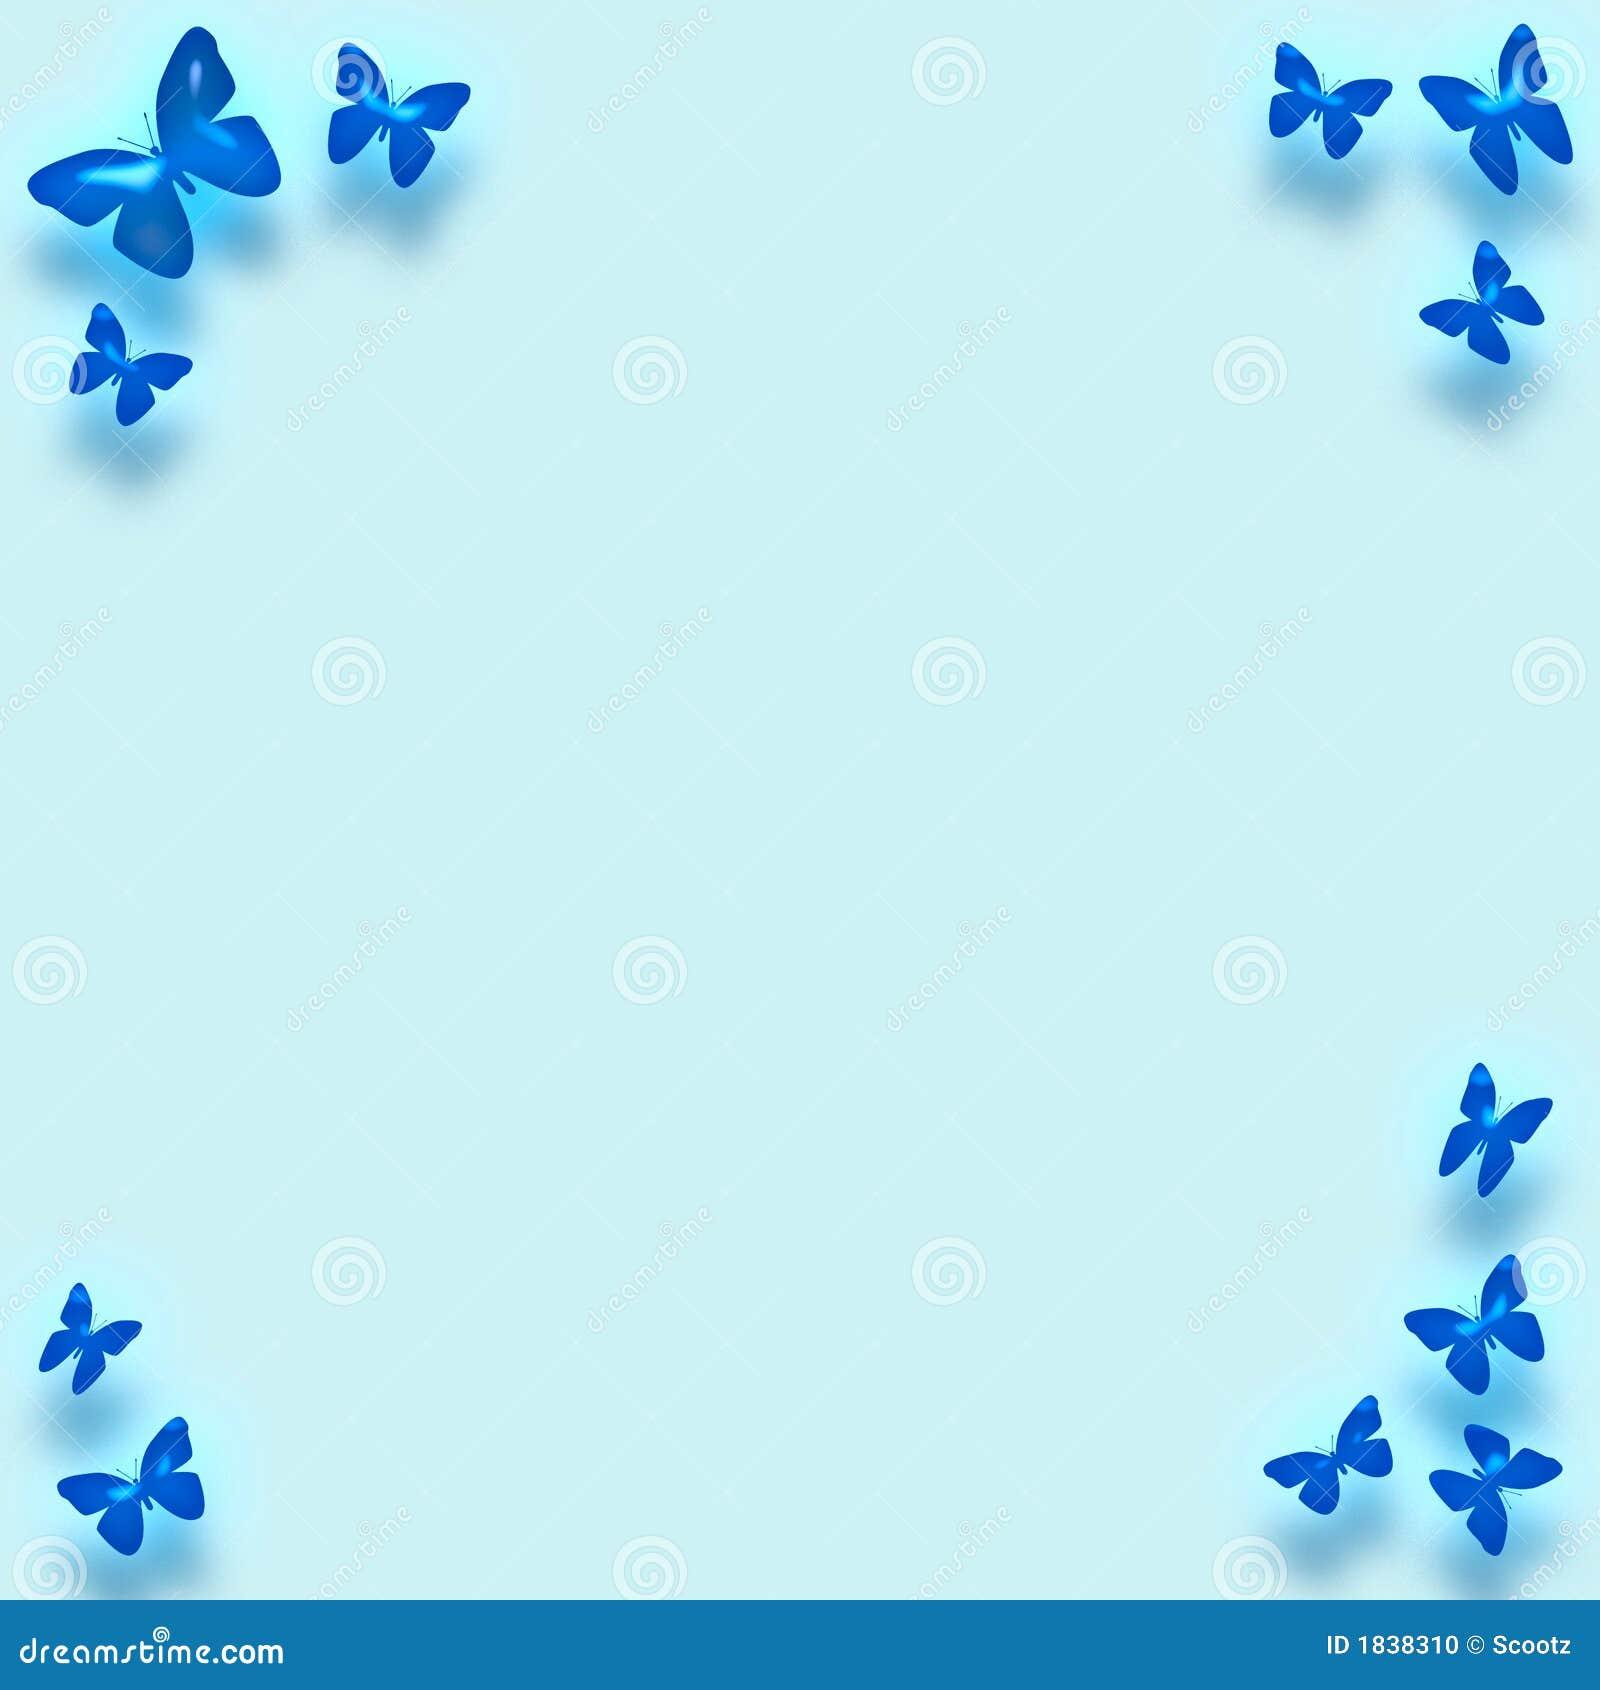 blue butterfly border stock illustration illustration of compose